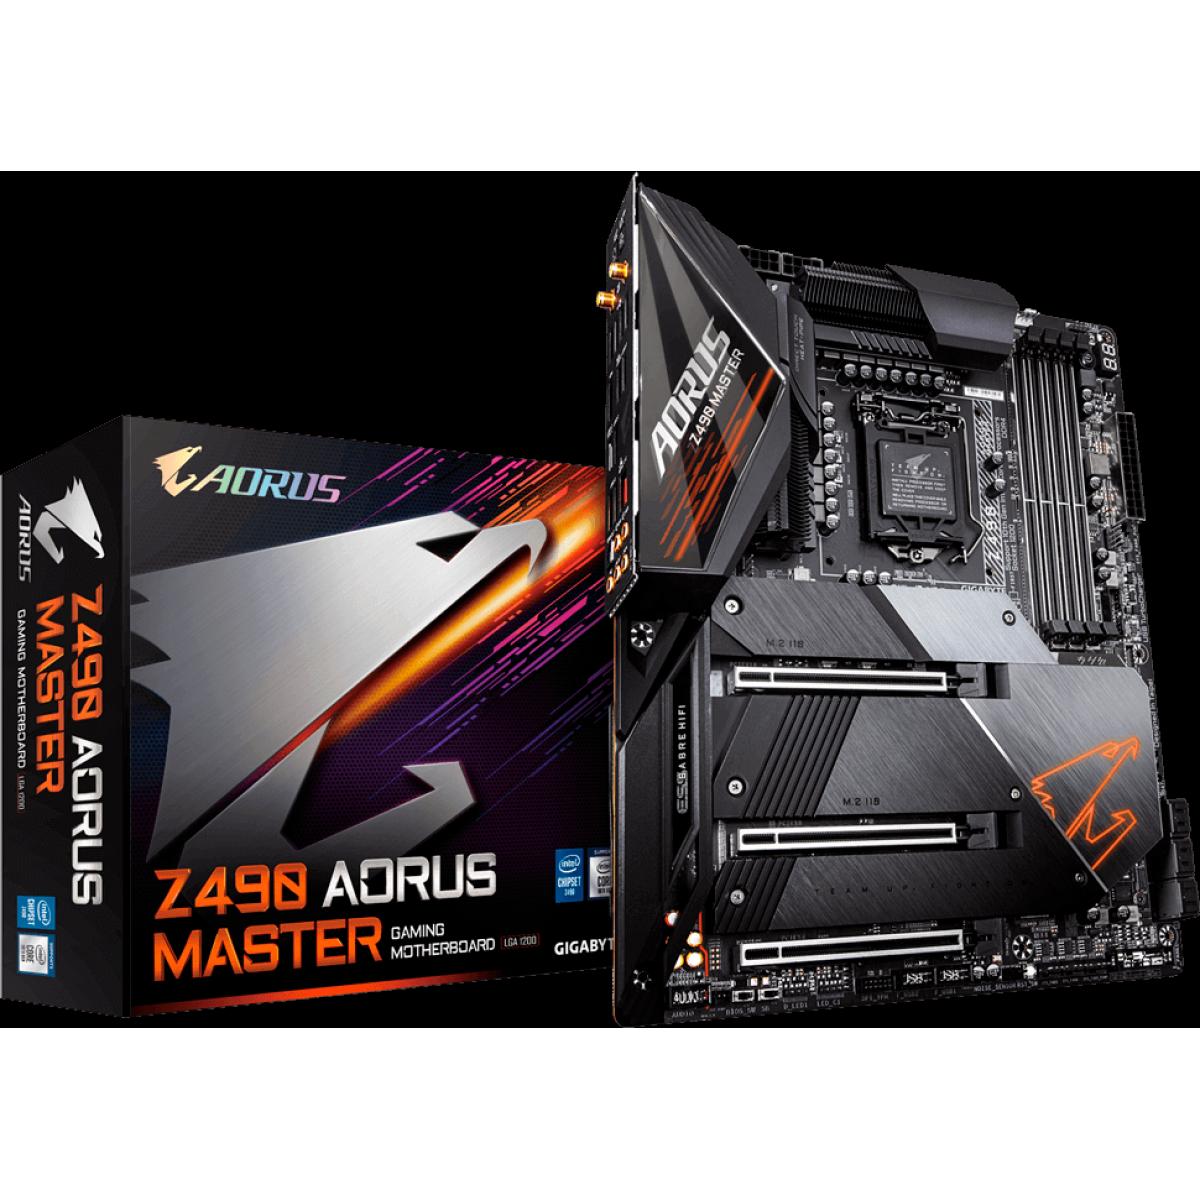 Placa Mãe Gigabyte Z490 Aorus Master, Chipset Z490, Intel LGA 1200, Wi-Fi, ATX, DDR4